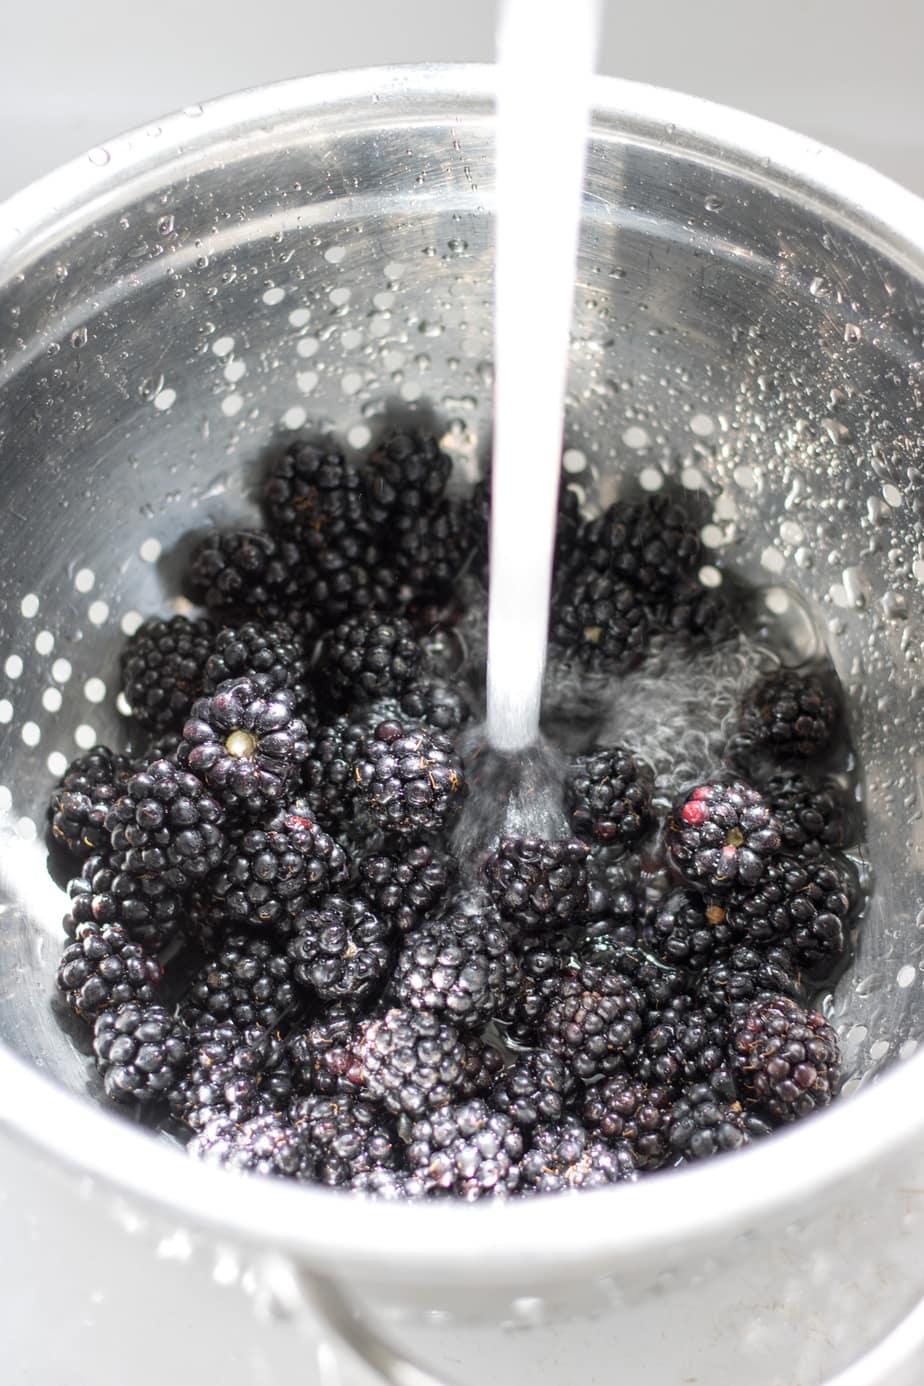 Blackberries being washed in a colander.